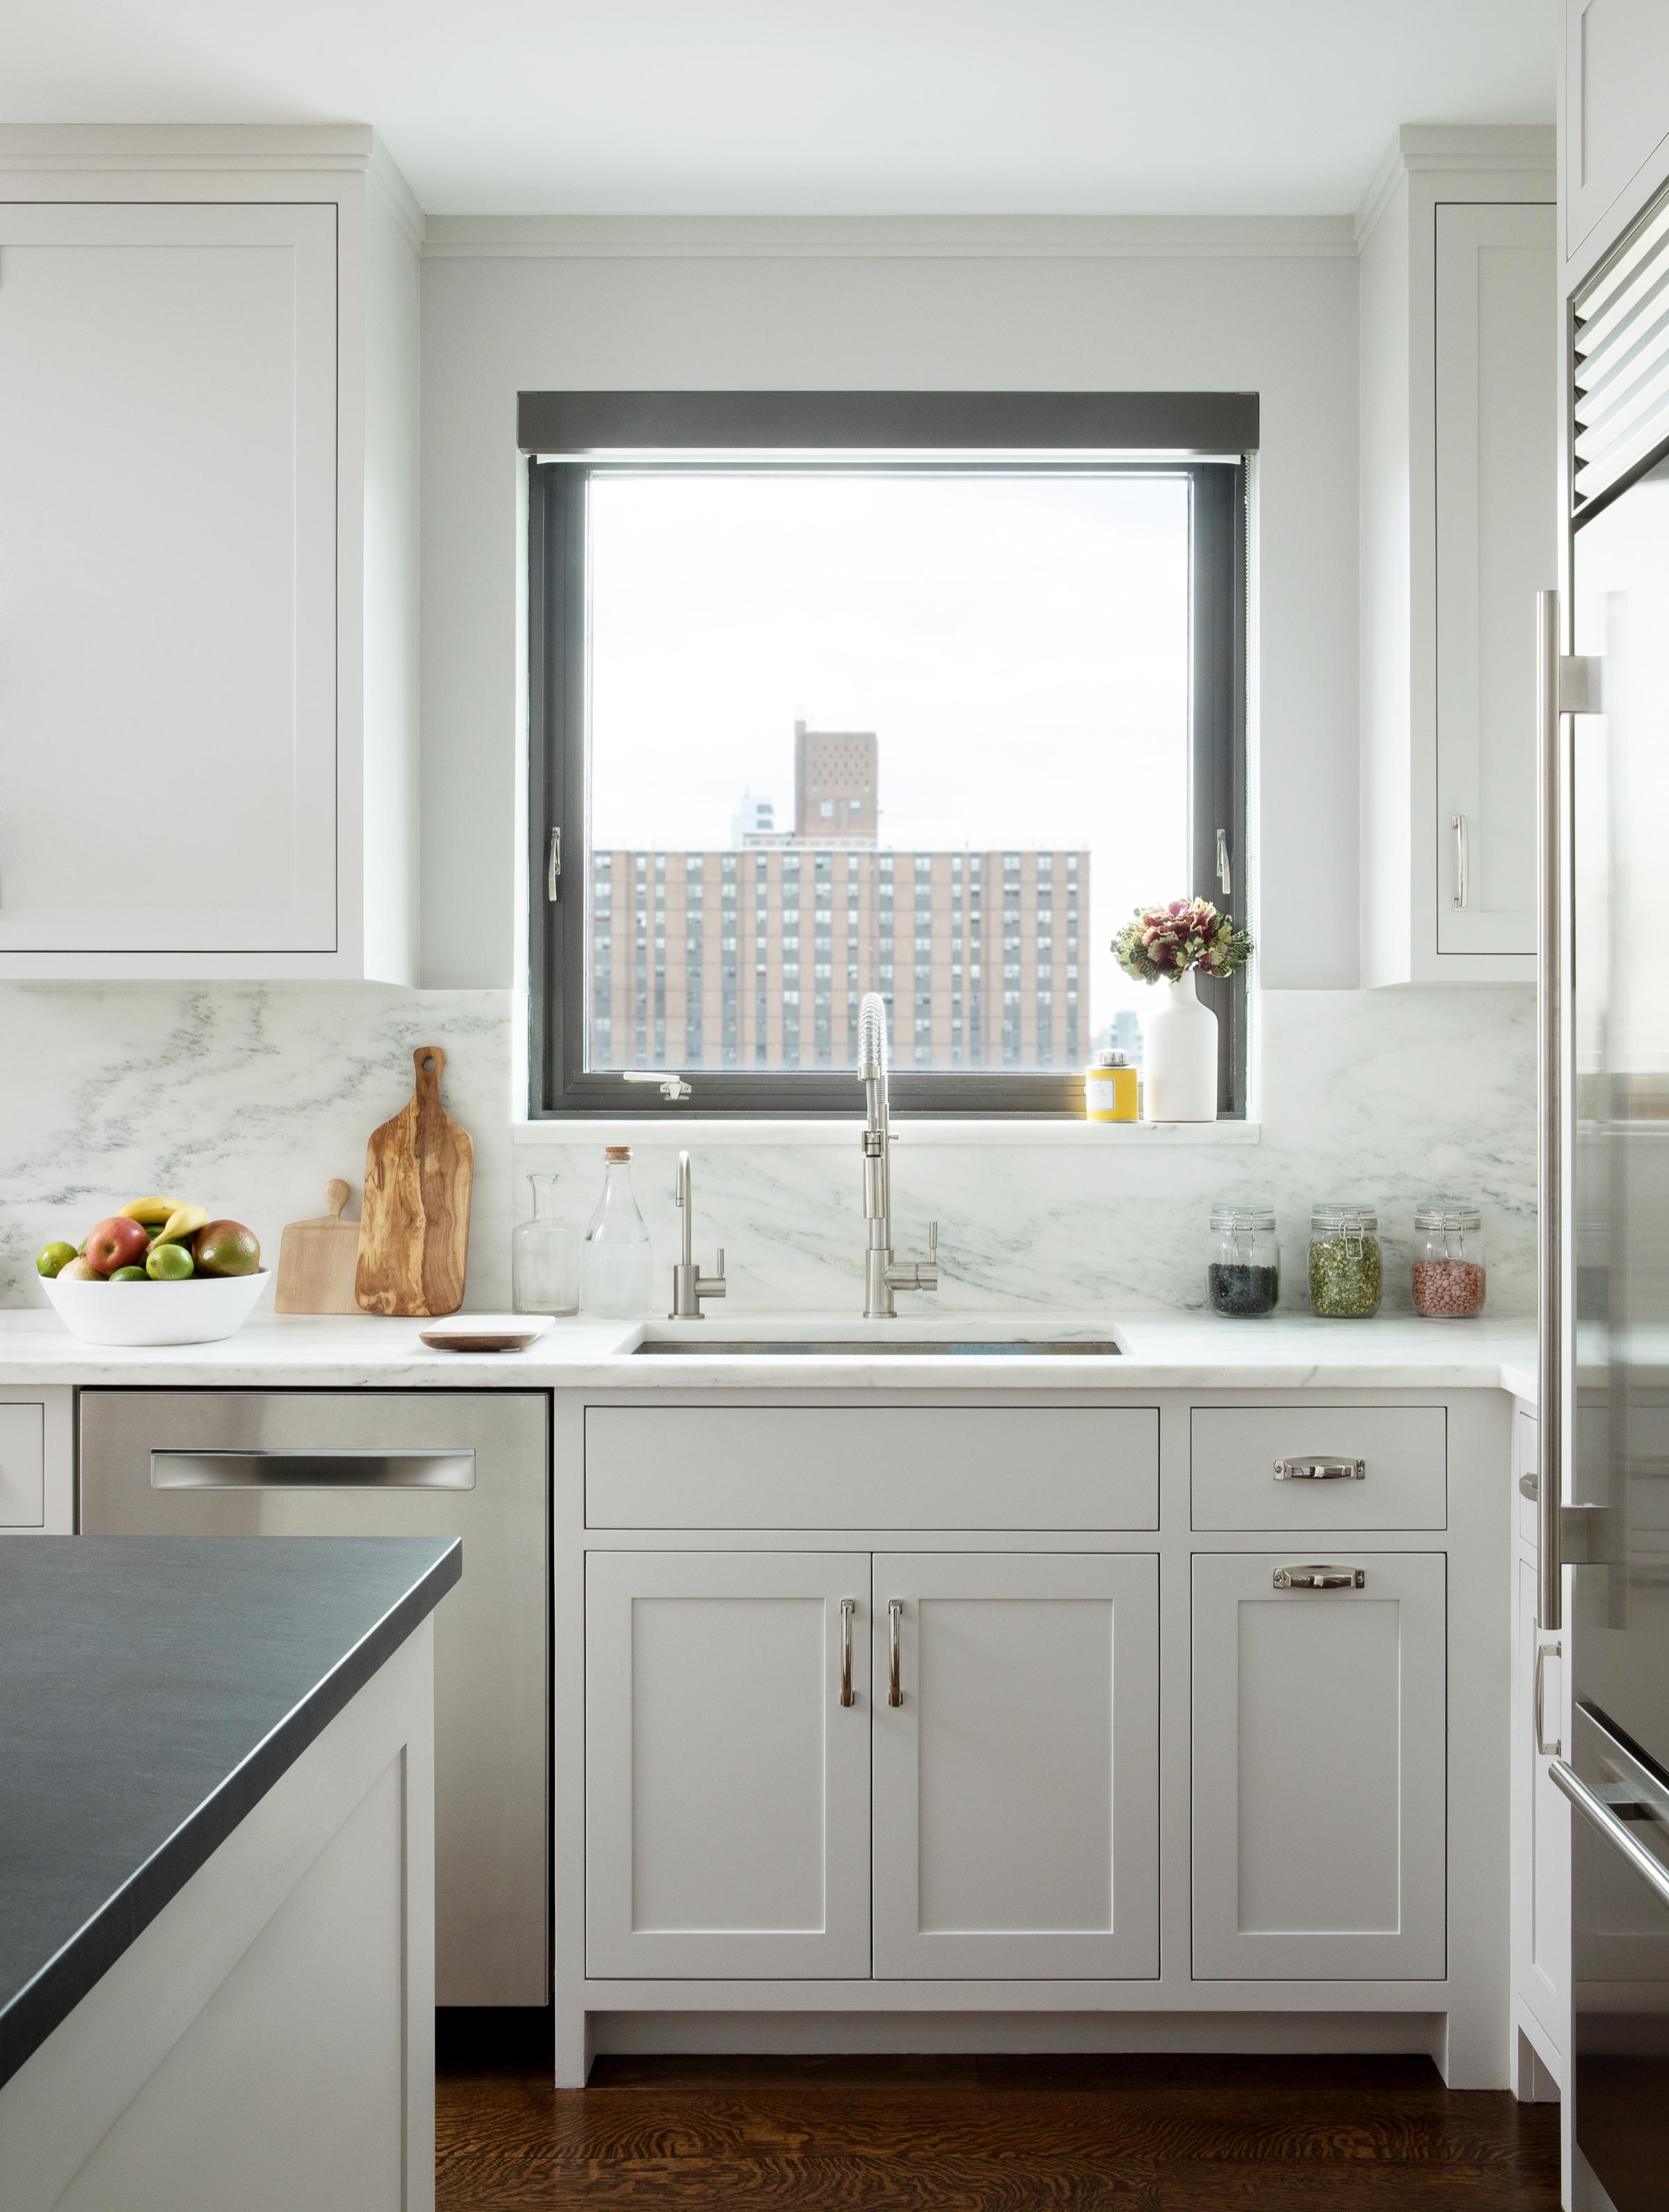 115-duplex-penthouse-kitchen-renovation-2